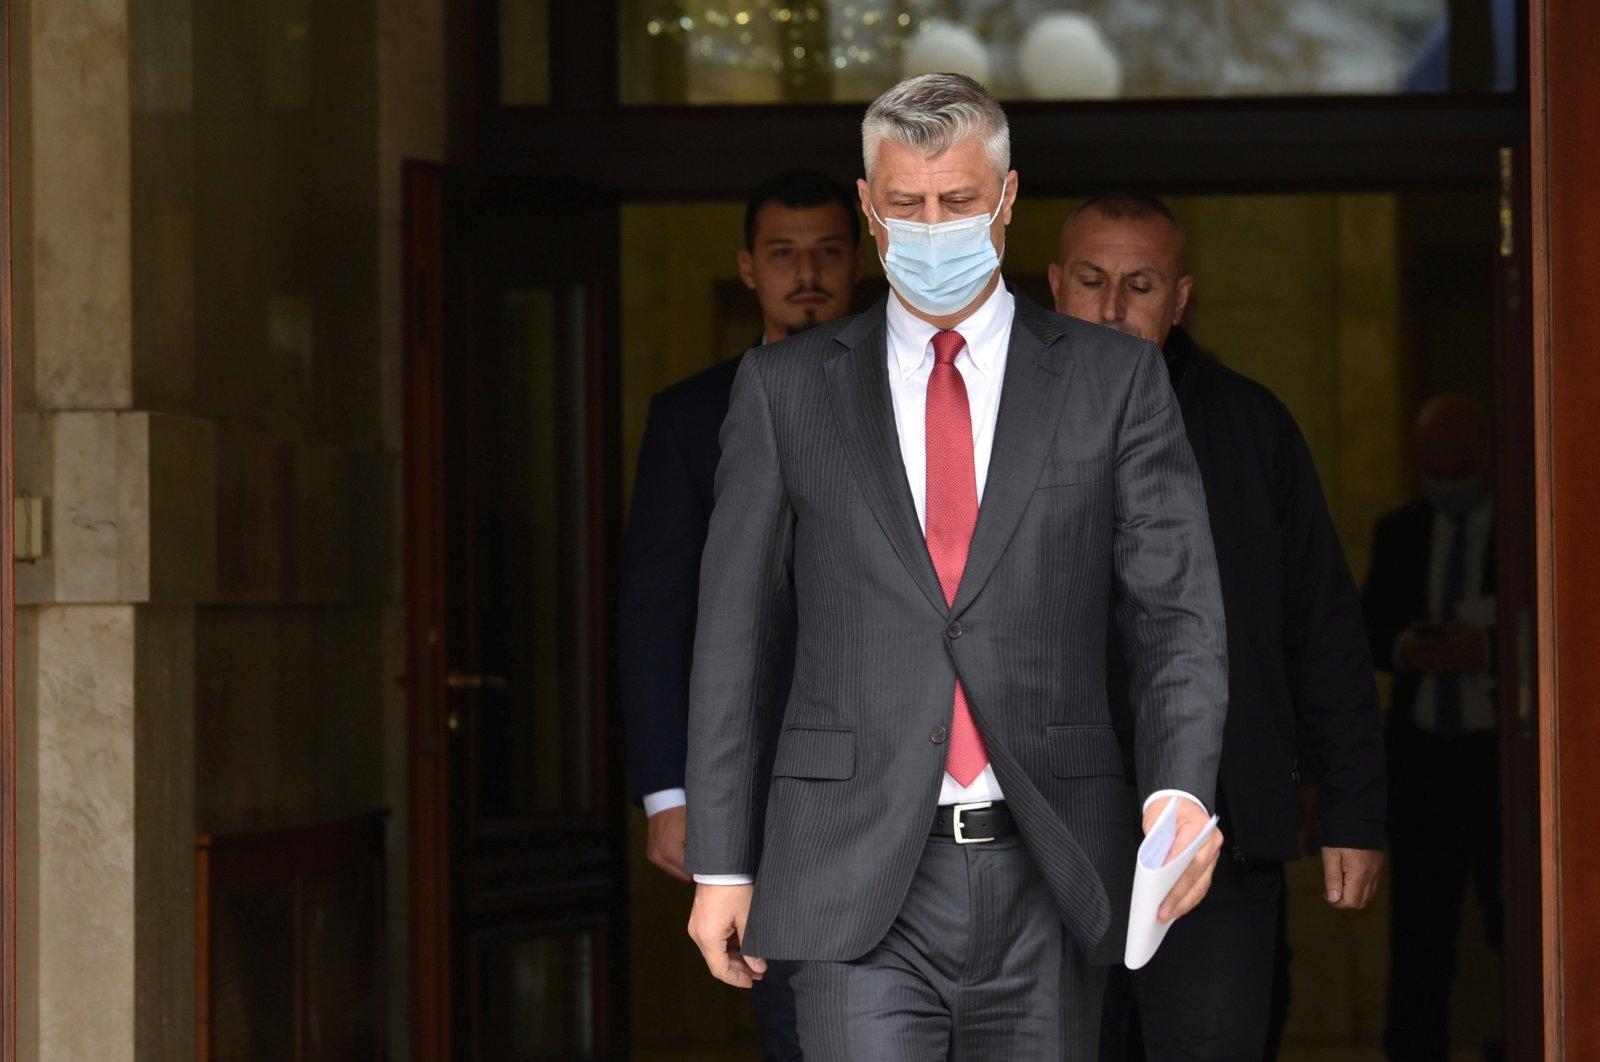 Kosovo's former President Hashim Thaci arrives for a news conference, Pristina, Kosovo, Nov. 5, 2020. (REUTERS Photo)